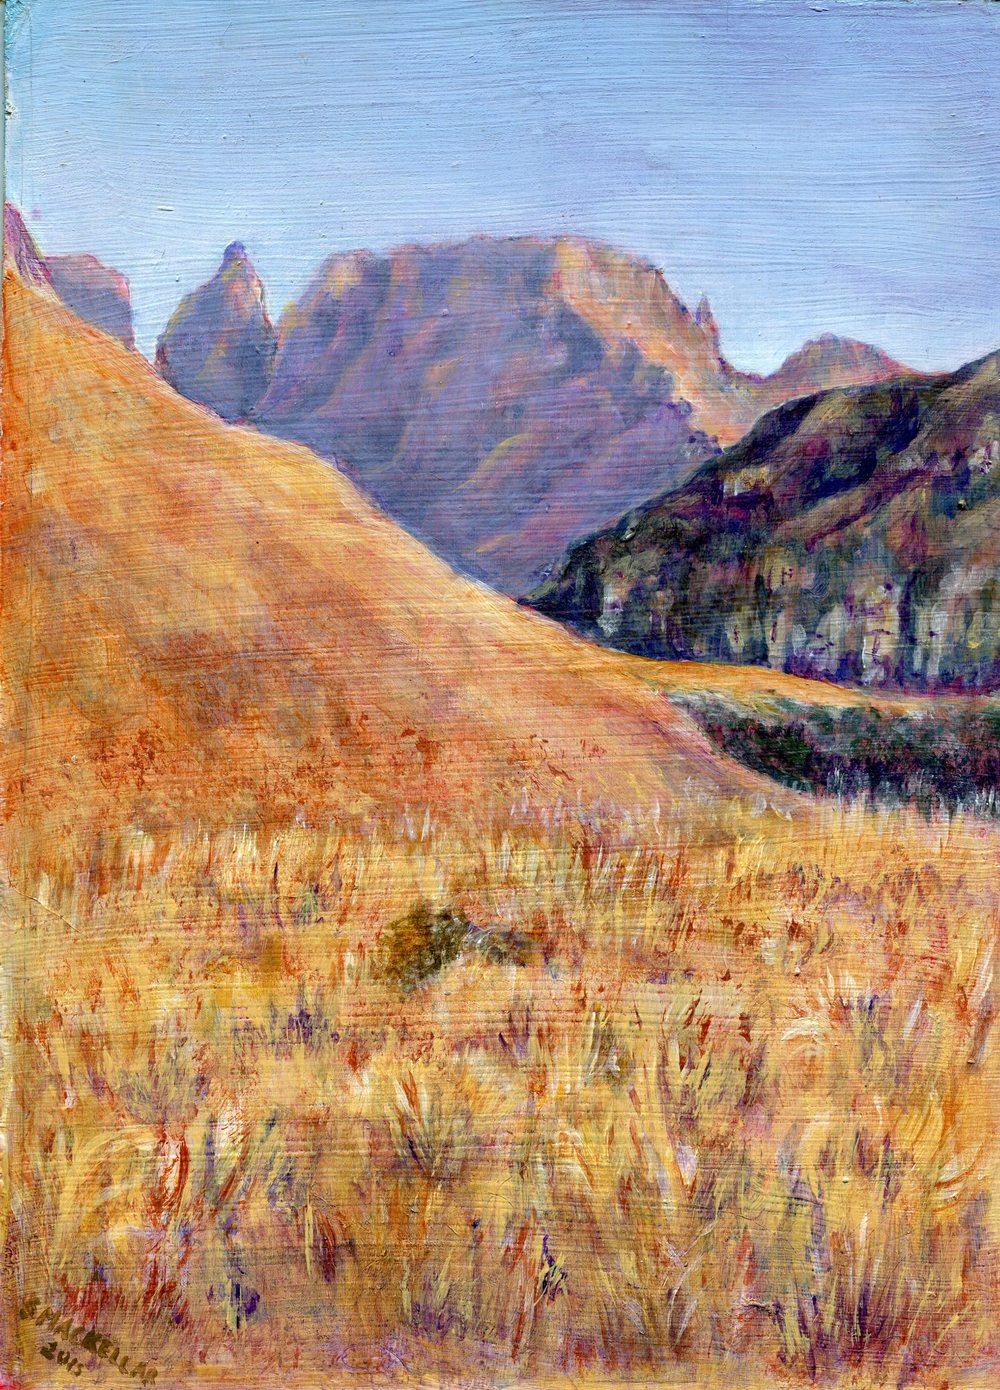 57  Mackellar, Shirley - Monks Cowl Drakensberg, Acrylic.jpg